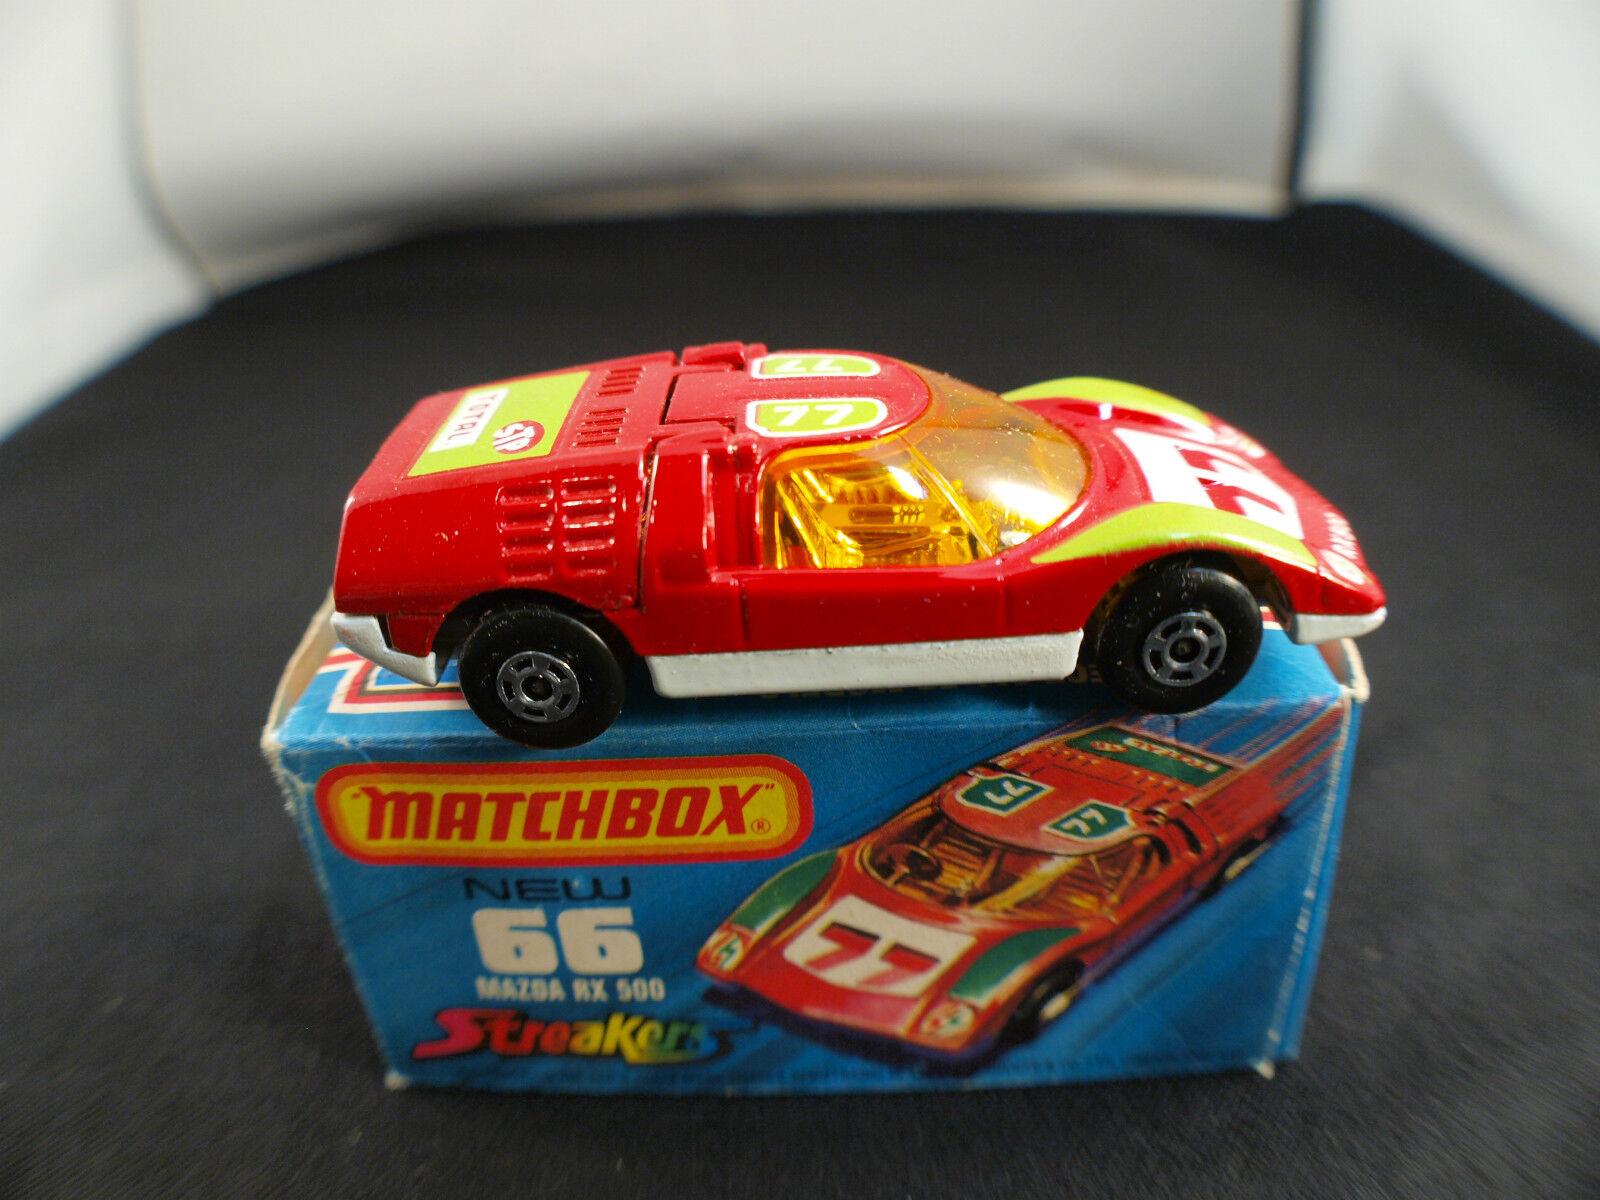 Matchbox Superfast New N° N° N° 66 Mazda RX500 neuf en boite MIB 1974 f11bd7